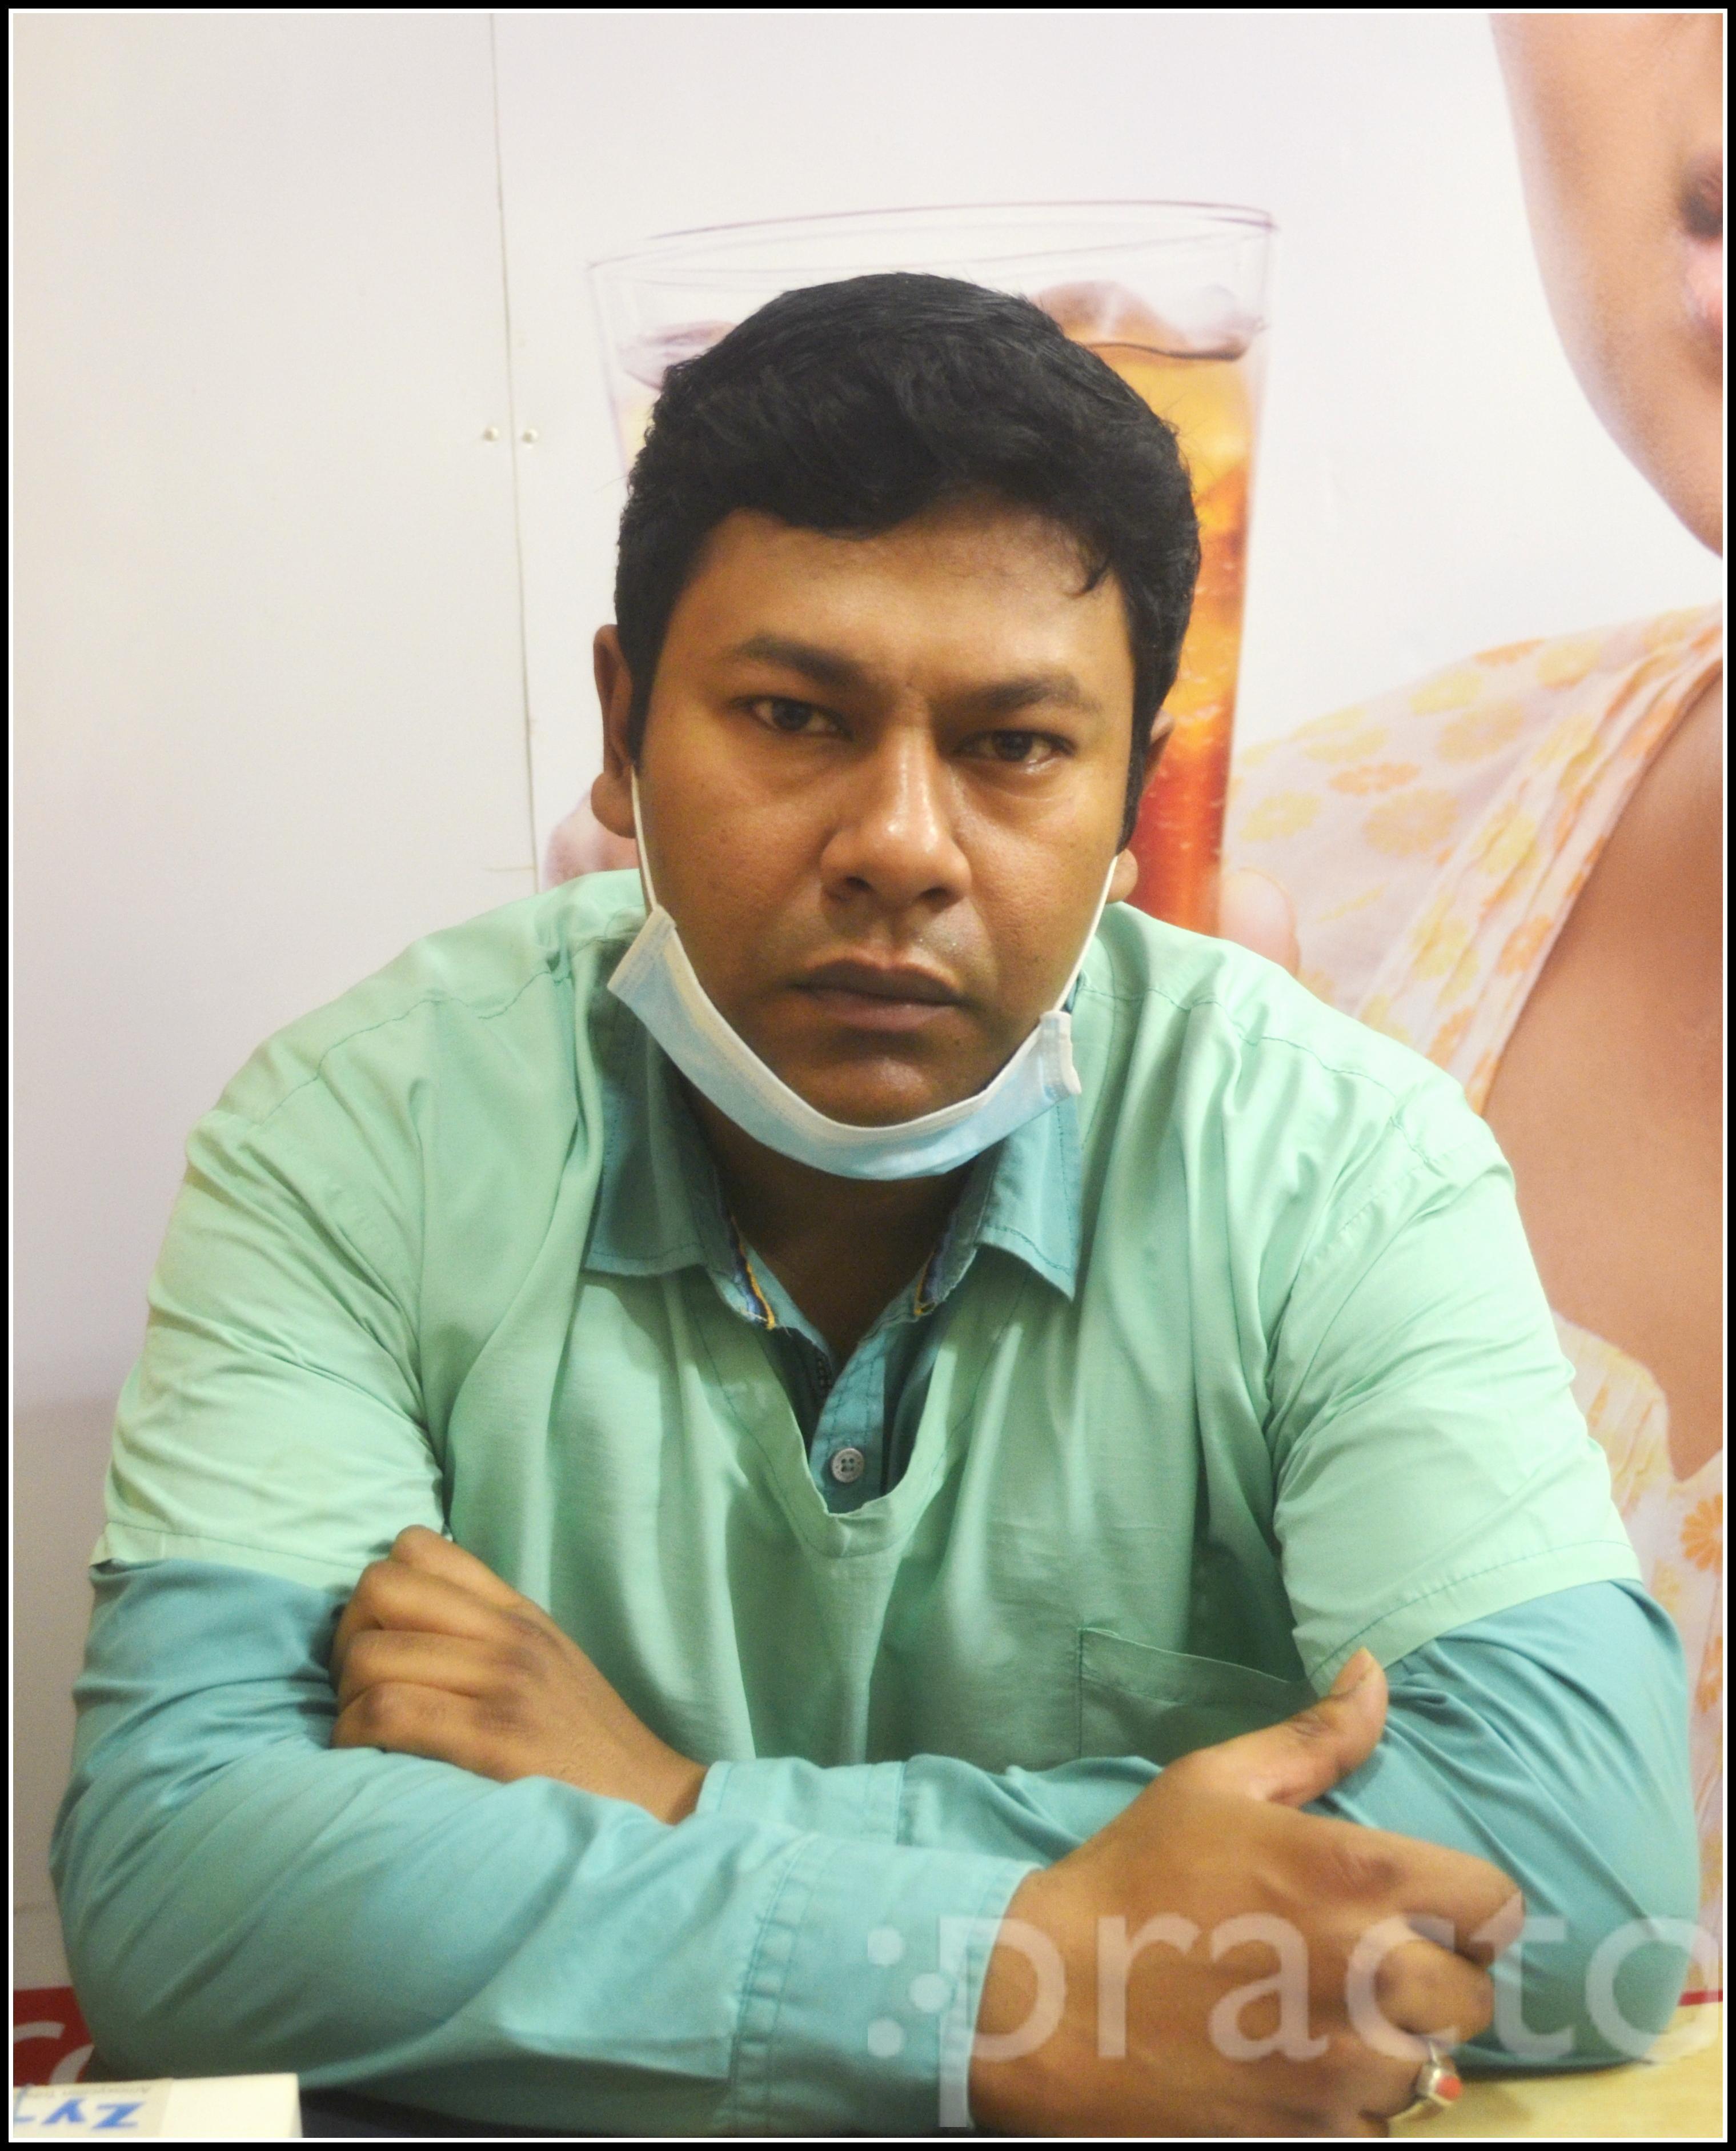 Dr. Prabir Samaddar - Dentist